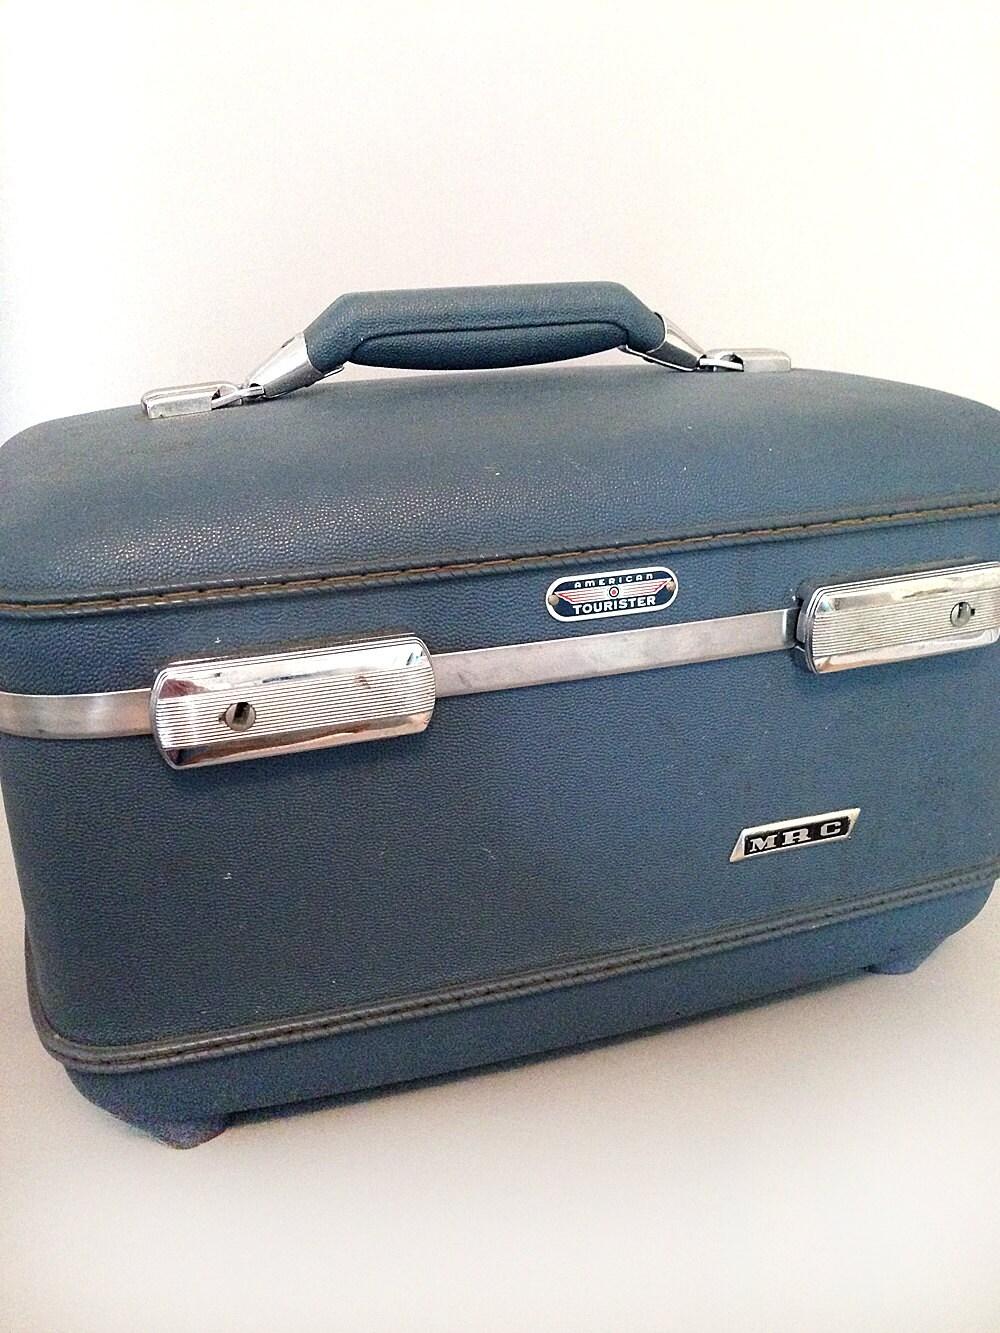 american tourister vanity luggage